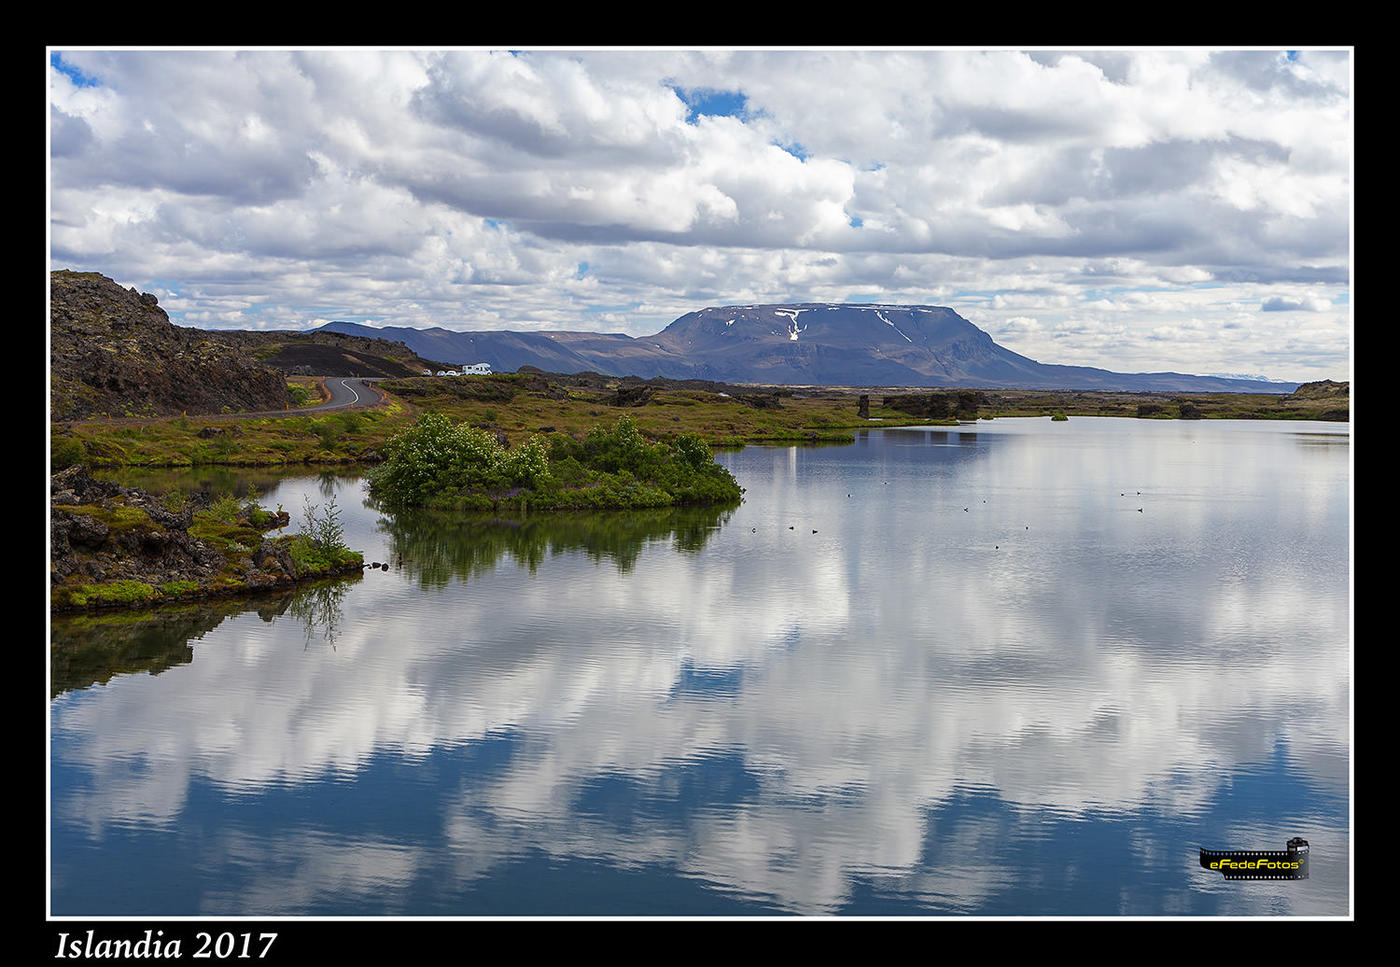 Paisajes de Islandia (Fede Rosillo)